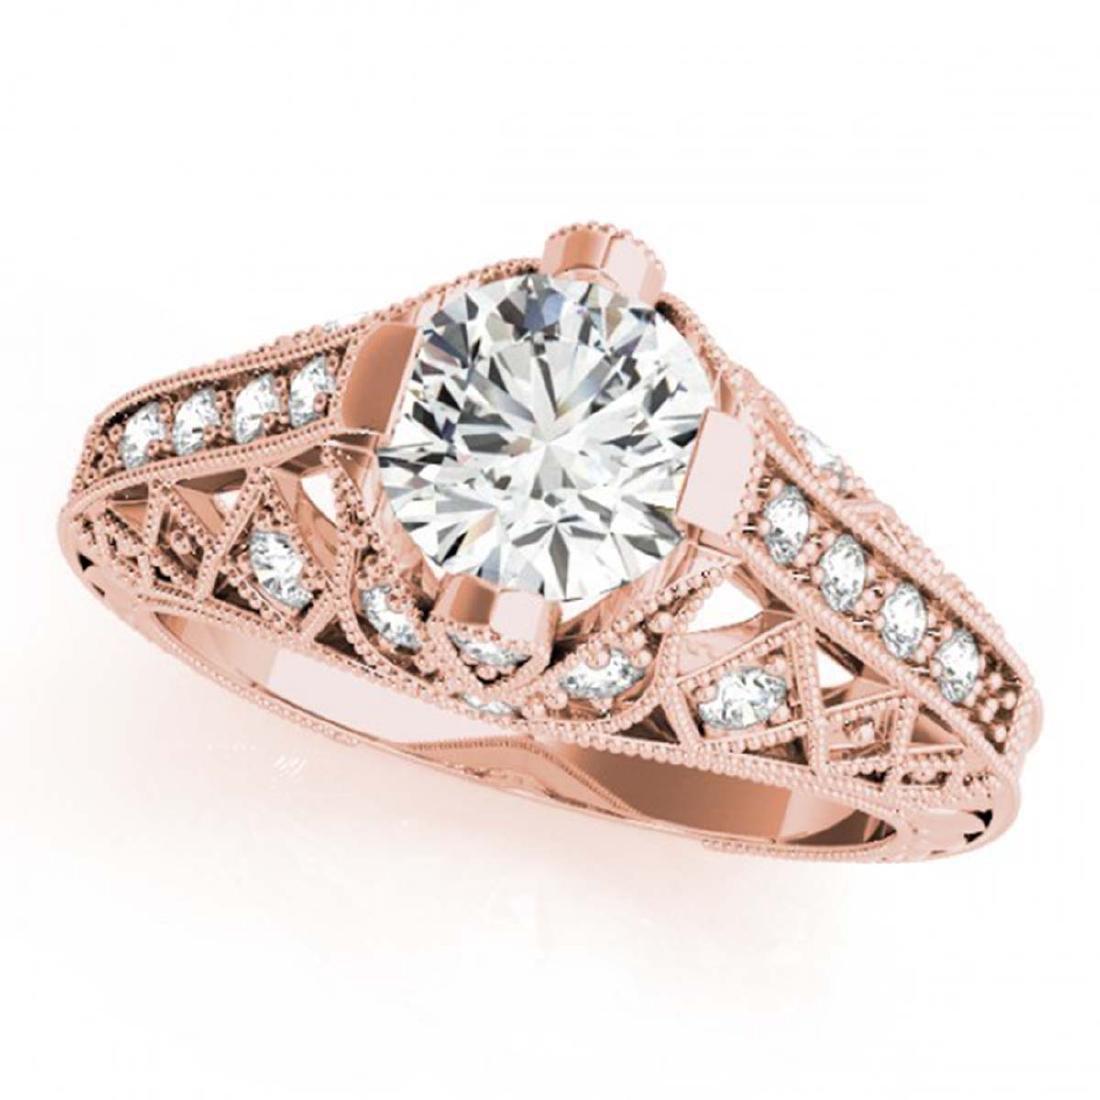 1.25 ctw VS/SI Diamond Ring 14K Rose Gold - REF-271R3K - 2